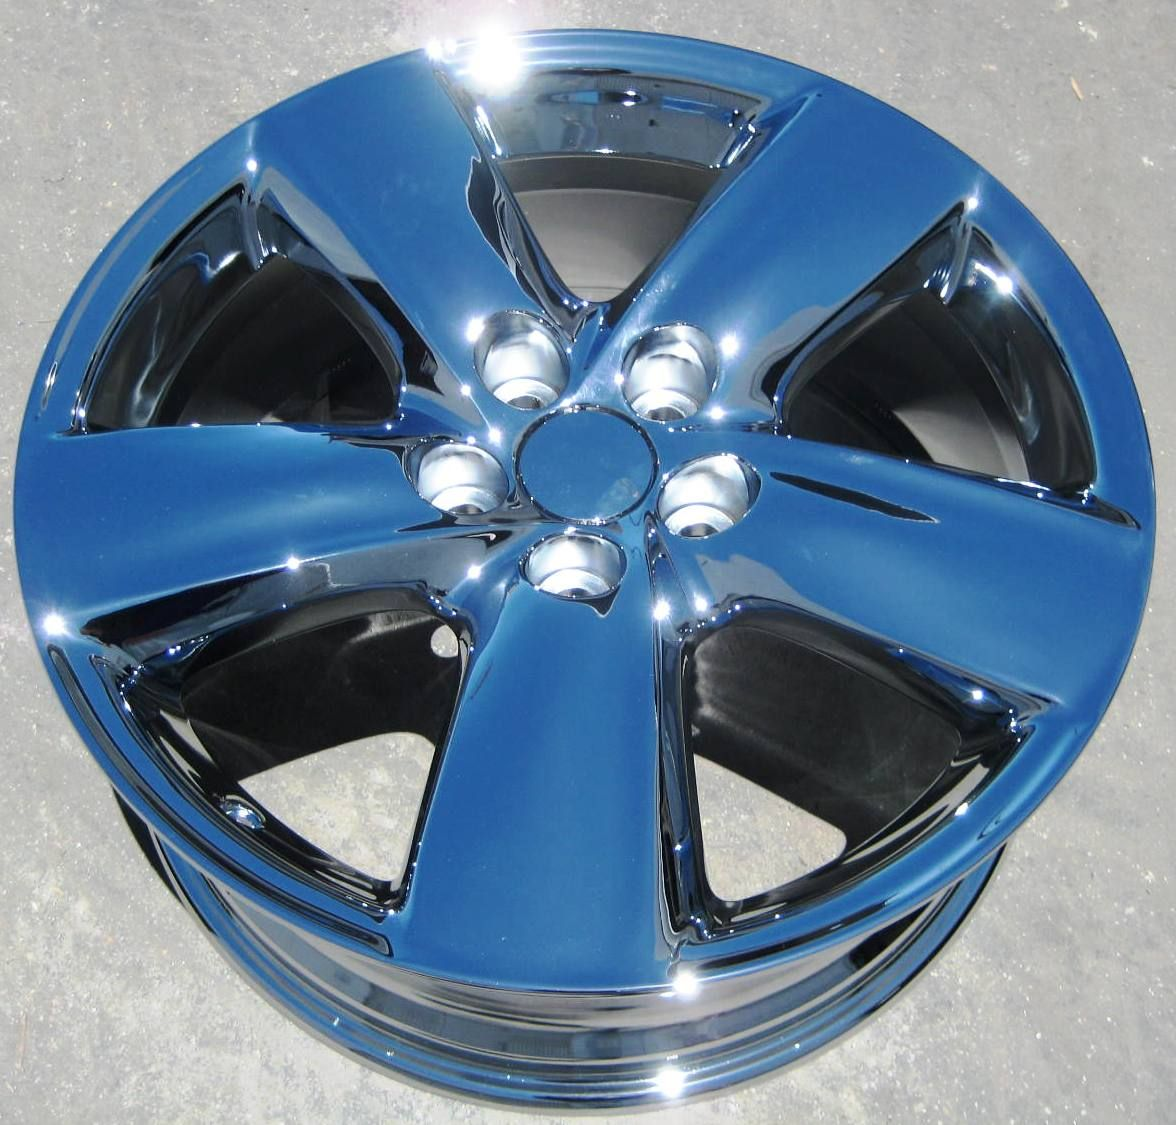 Stock 4 New Factory 19 Lexus LS460 LS600HL Chrome Wheels Rims